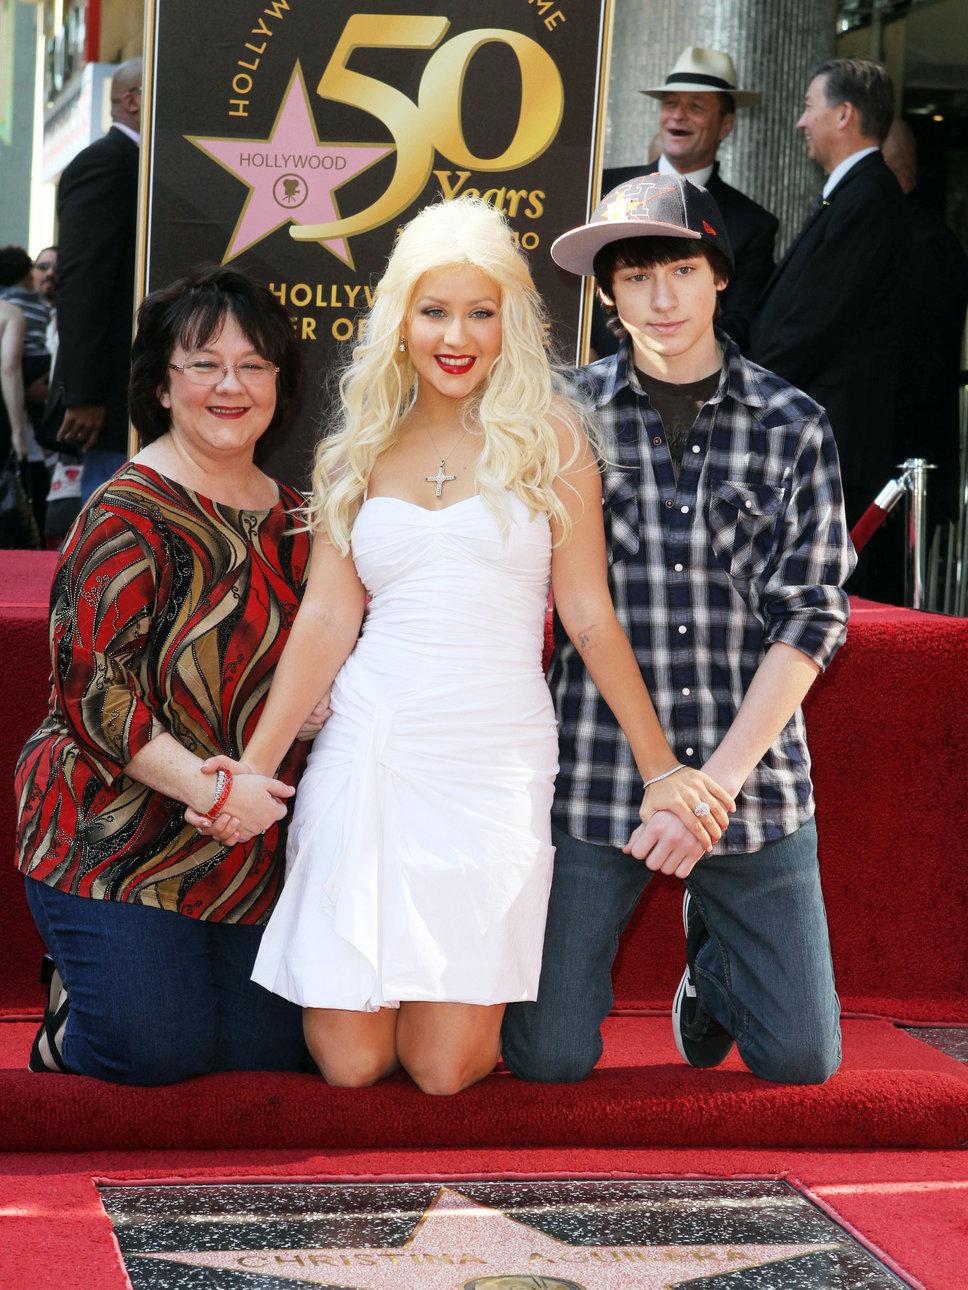 [Fotos+Video] Christina Aguilera y su Hermano yendo de Compras a Fred Segal (30/Mar/12) Christina_aguilera_c_with_mo